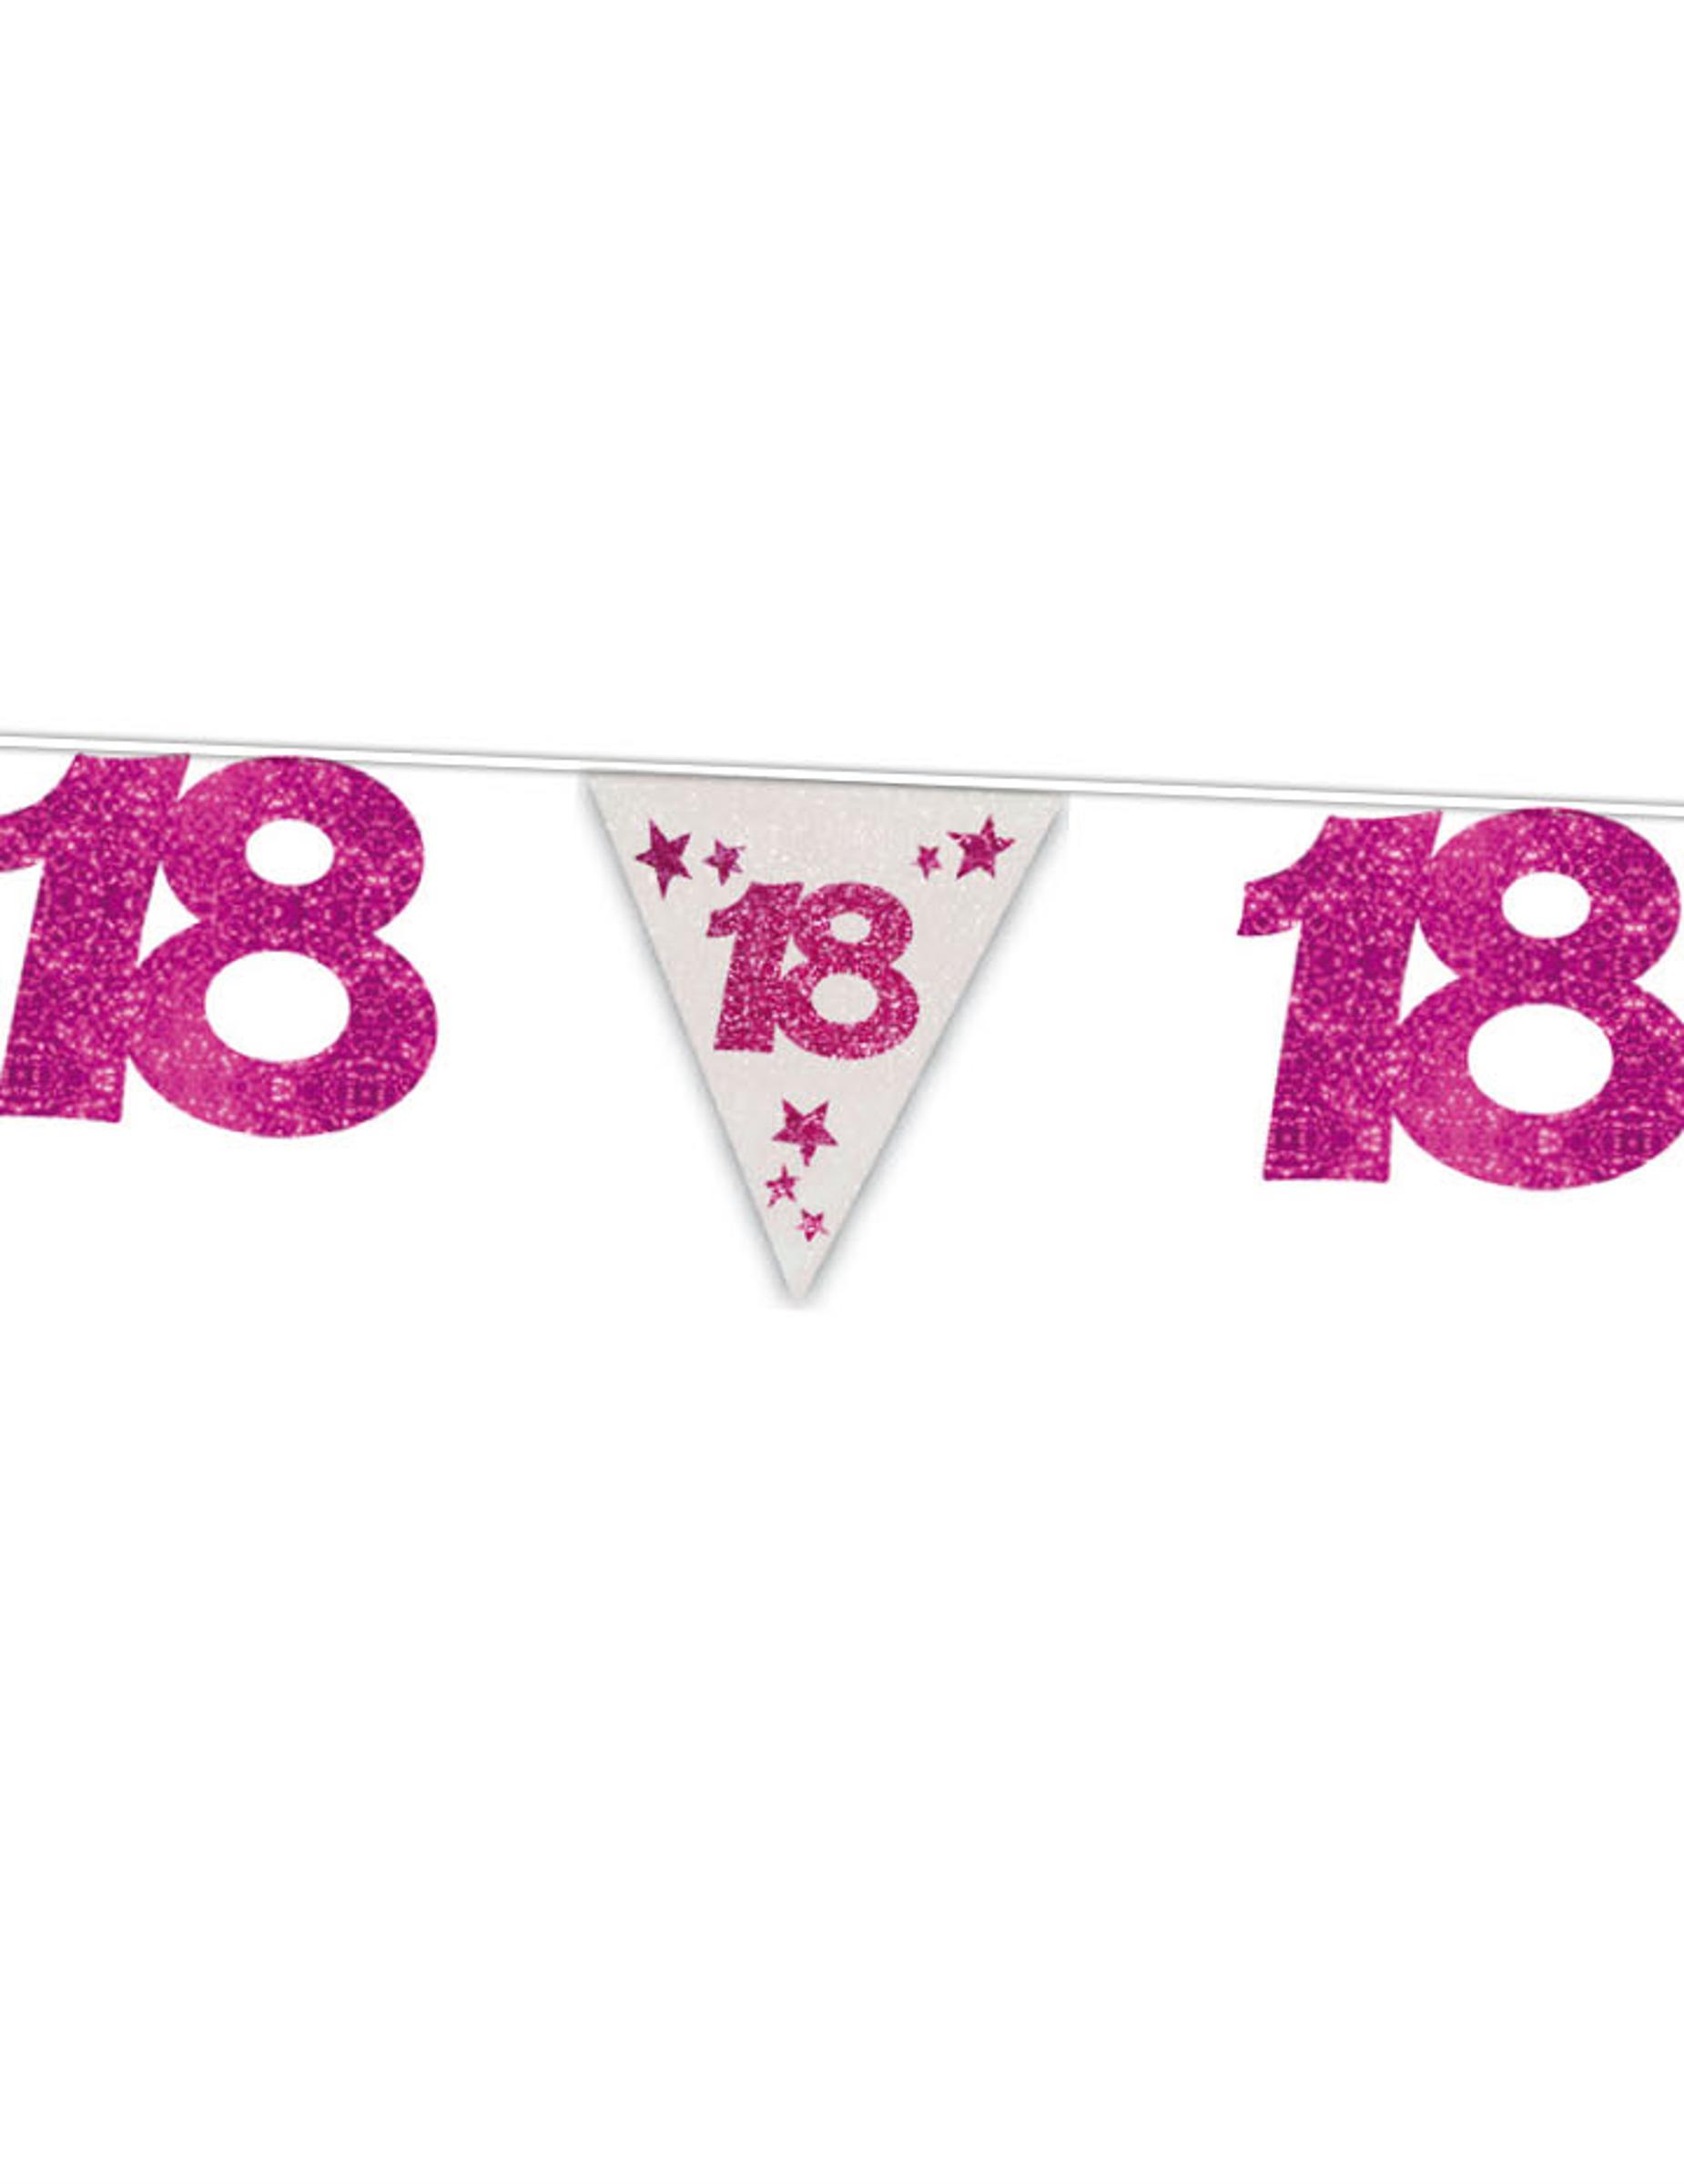 glitzernde girlande 18 geburtstag rosa g nstige faschings partydeko zubeh r bei karneval. Black Bedroom Furniture Sets. Home Design Ideas